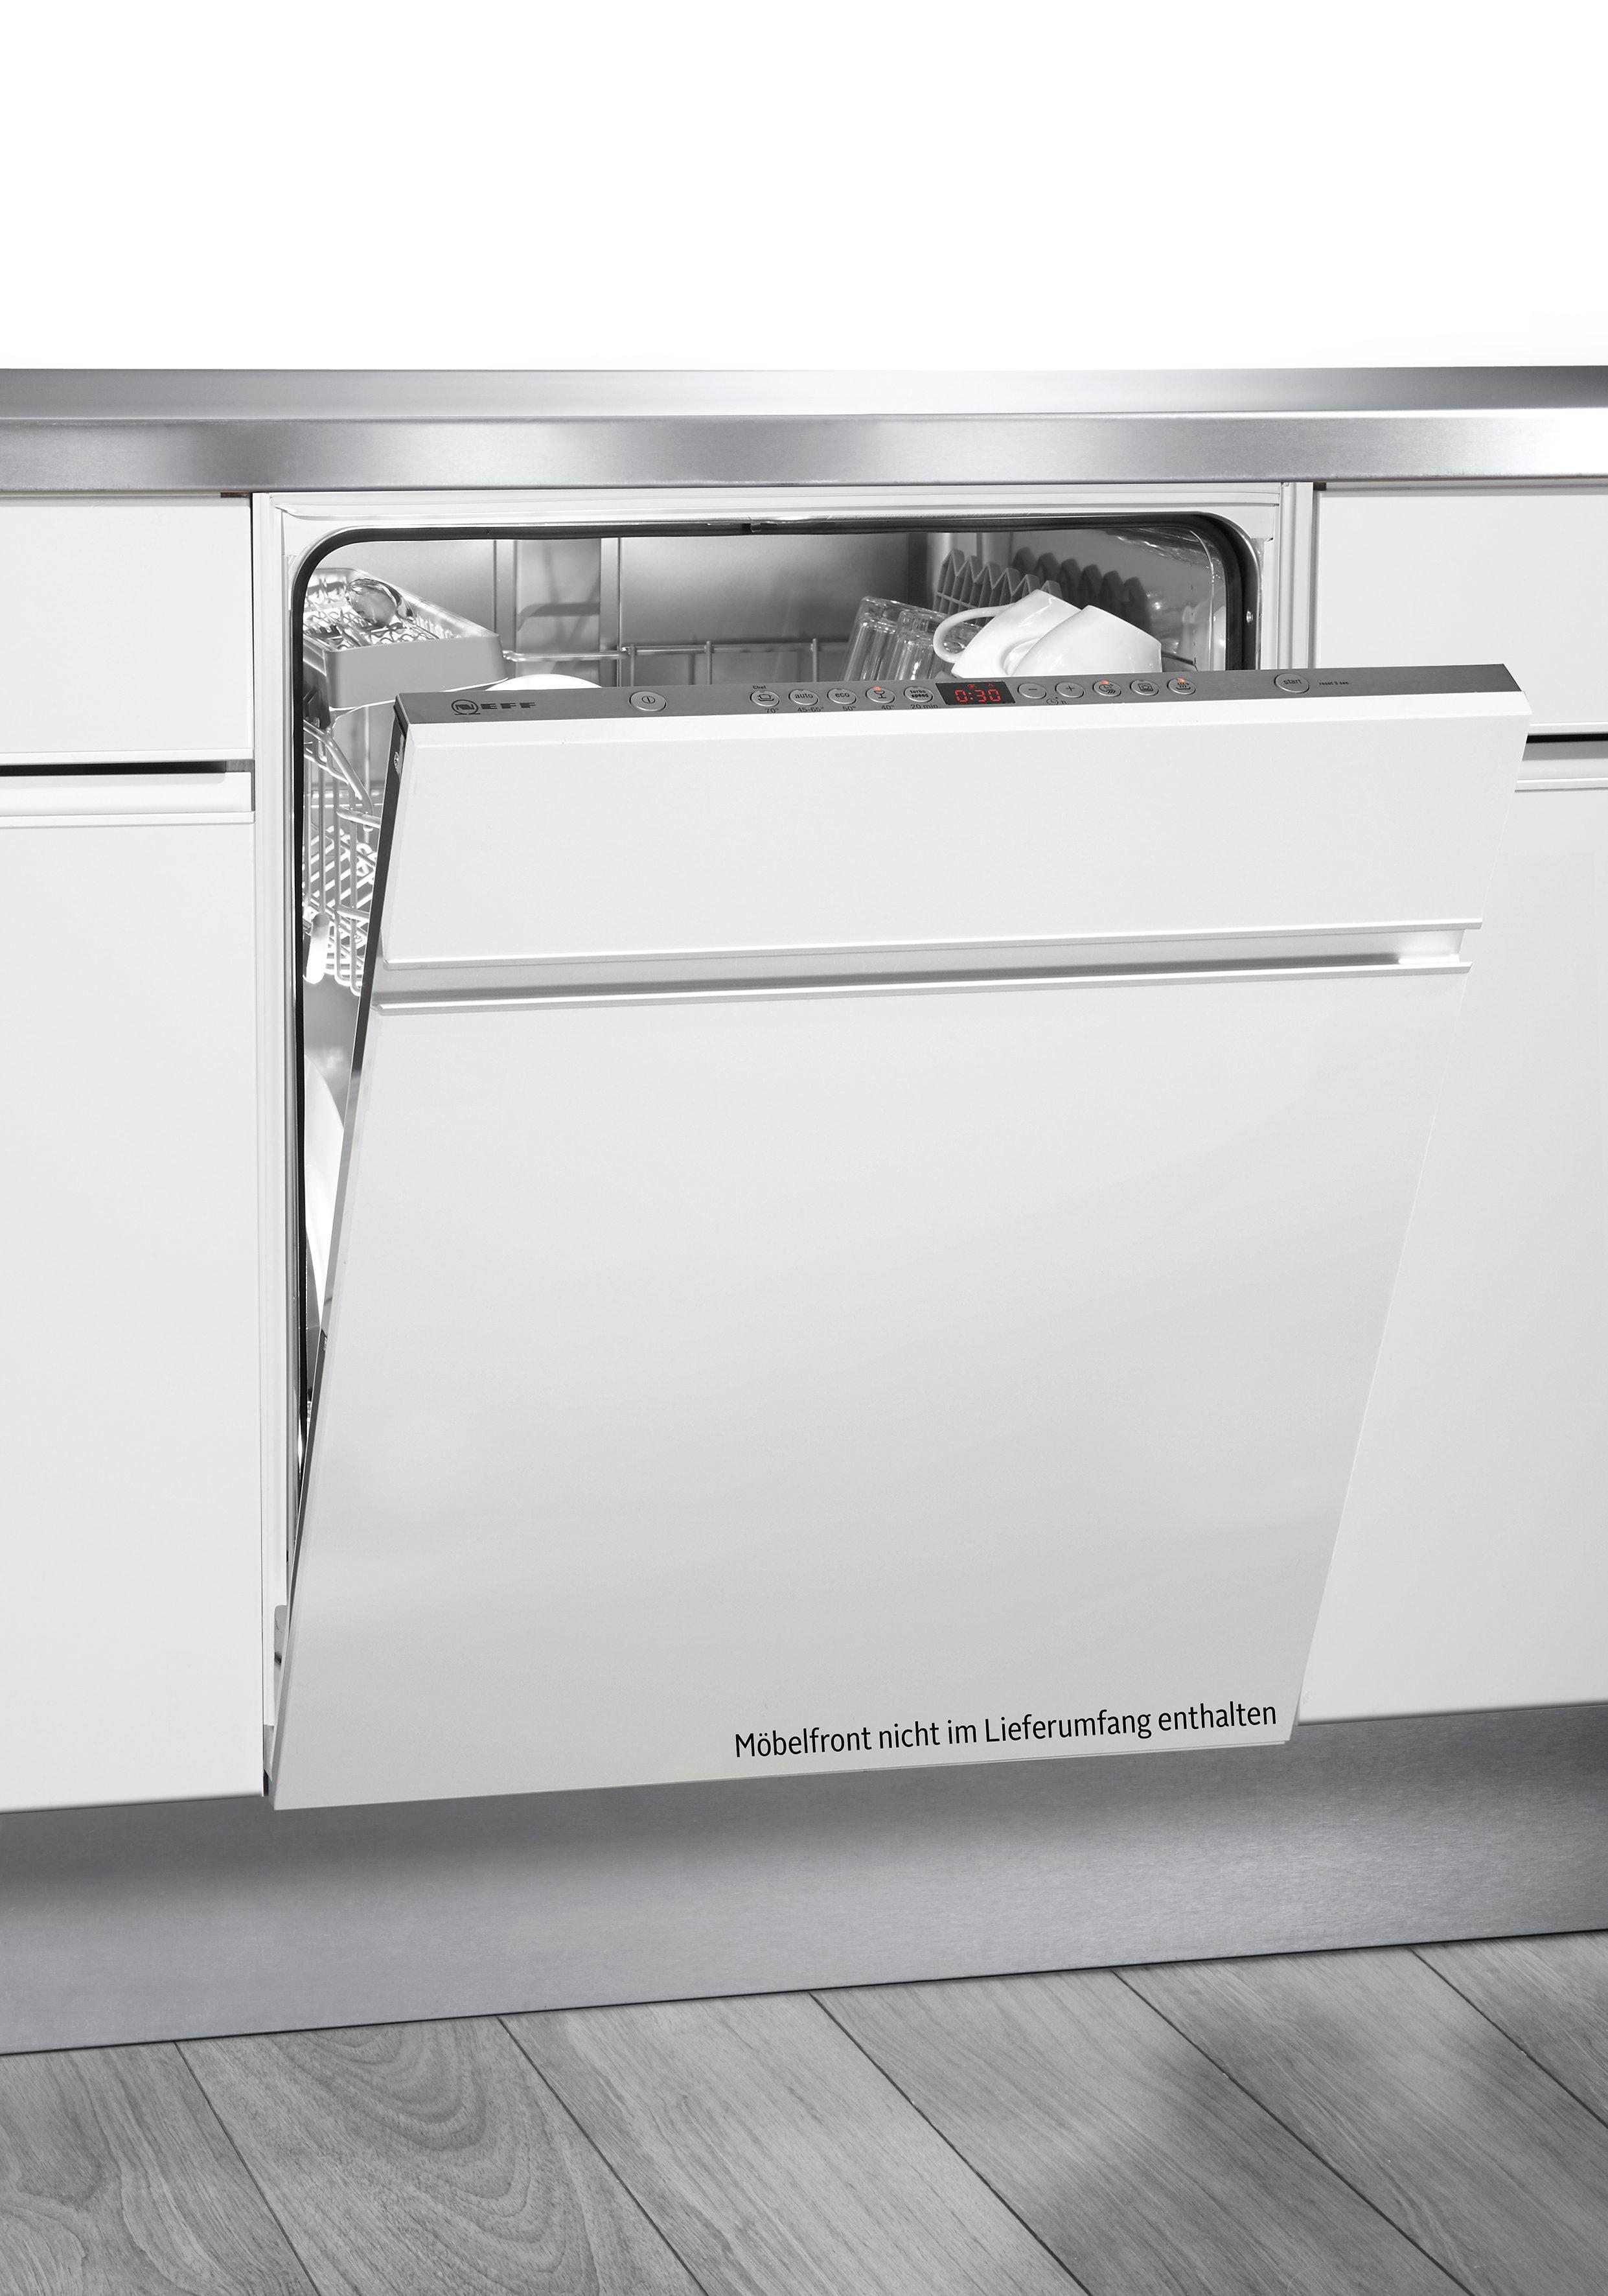 Neff vollintegrierbarer Einbaugeschirrspüler GX 52 / S52N52X2EU, A++, 6,5 Liter, 13 Maßgedecke